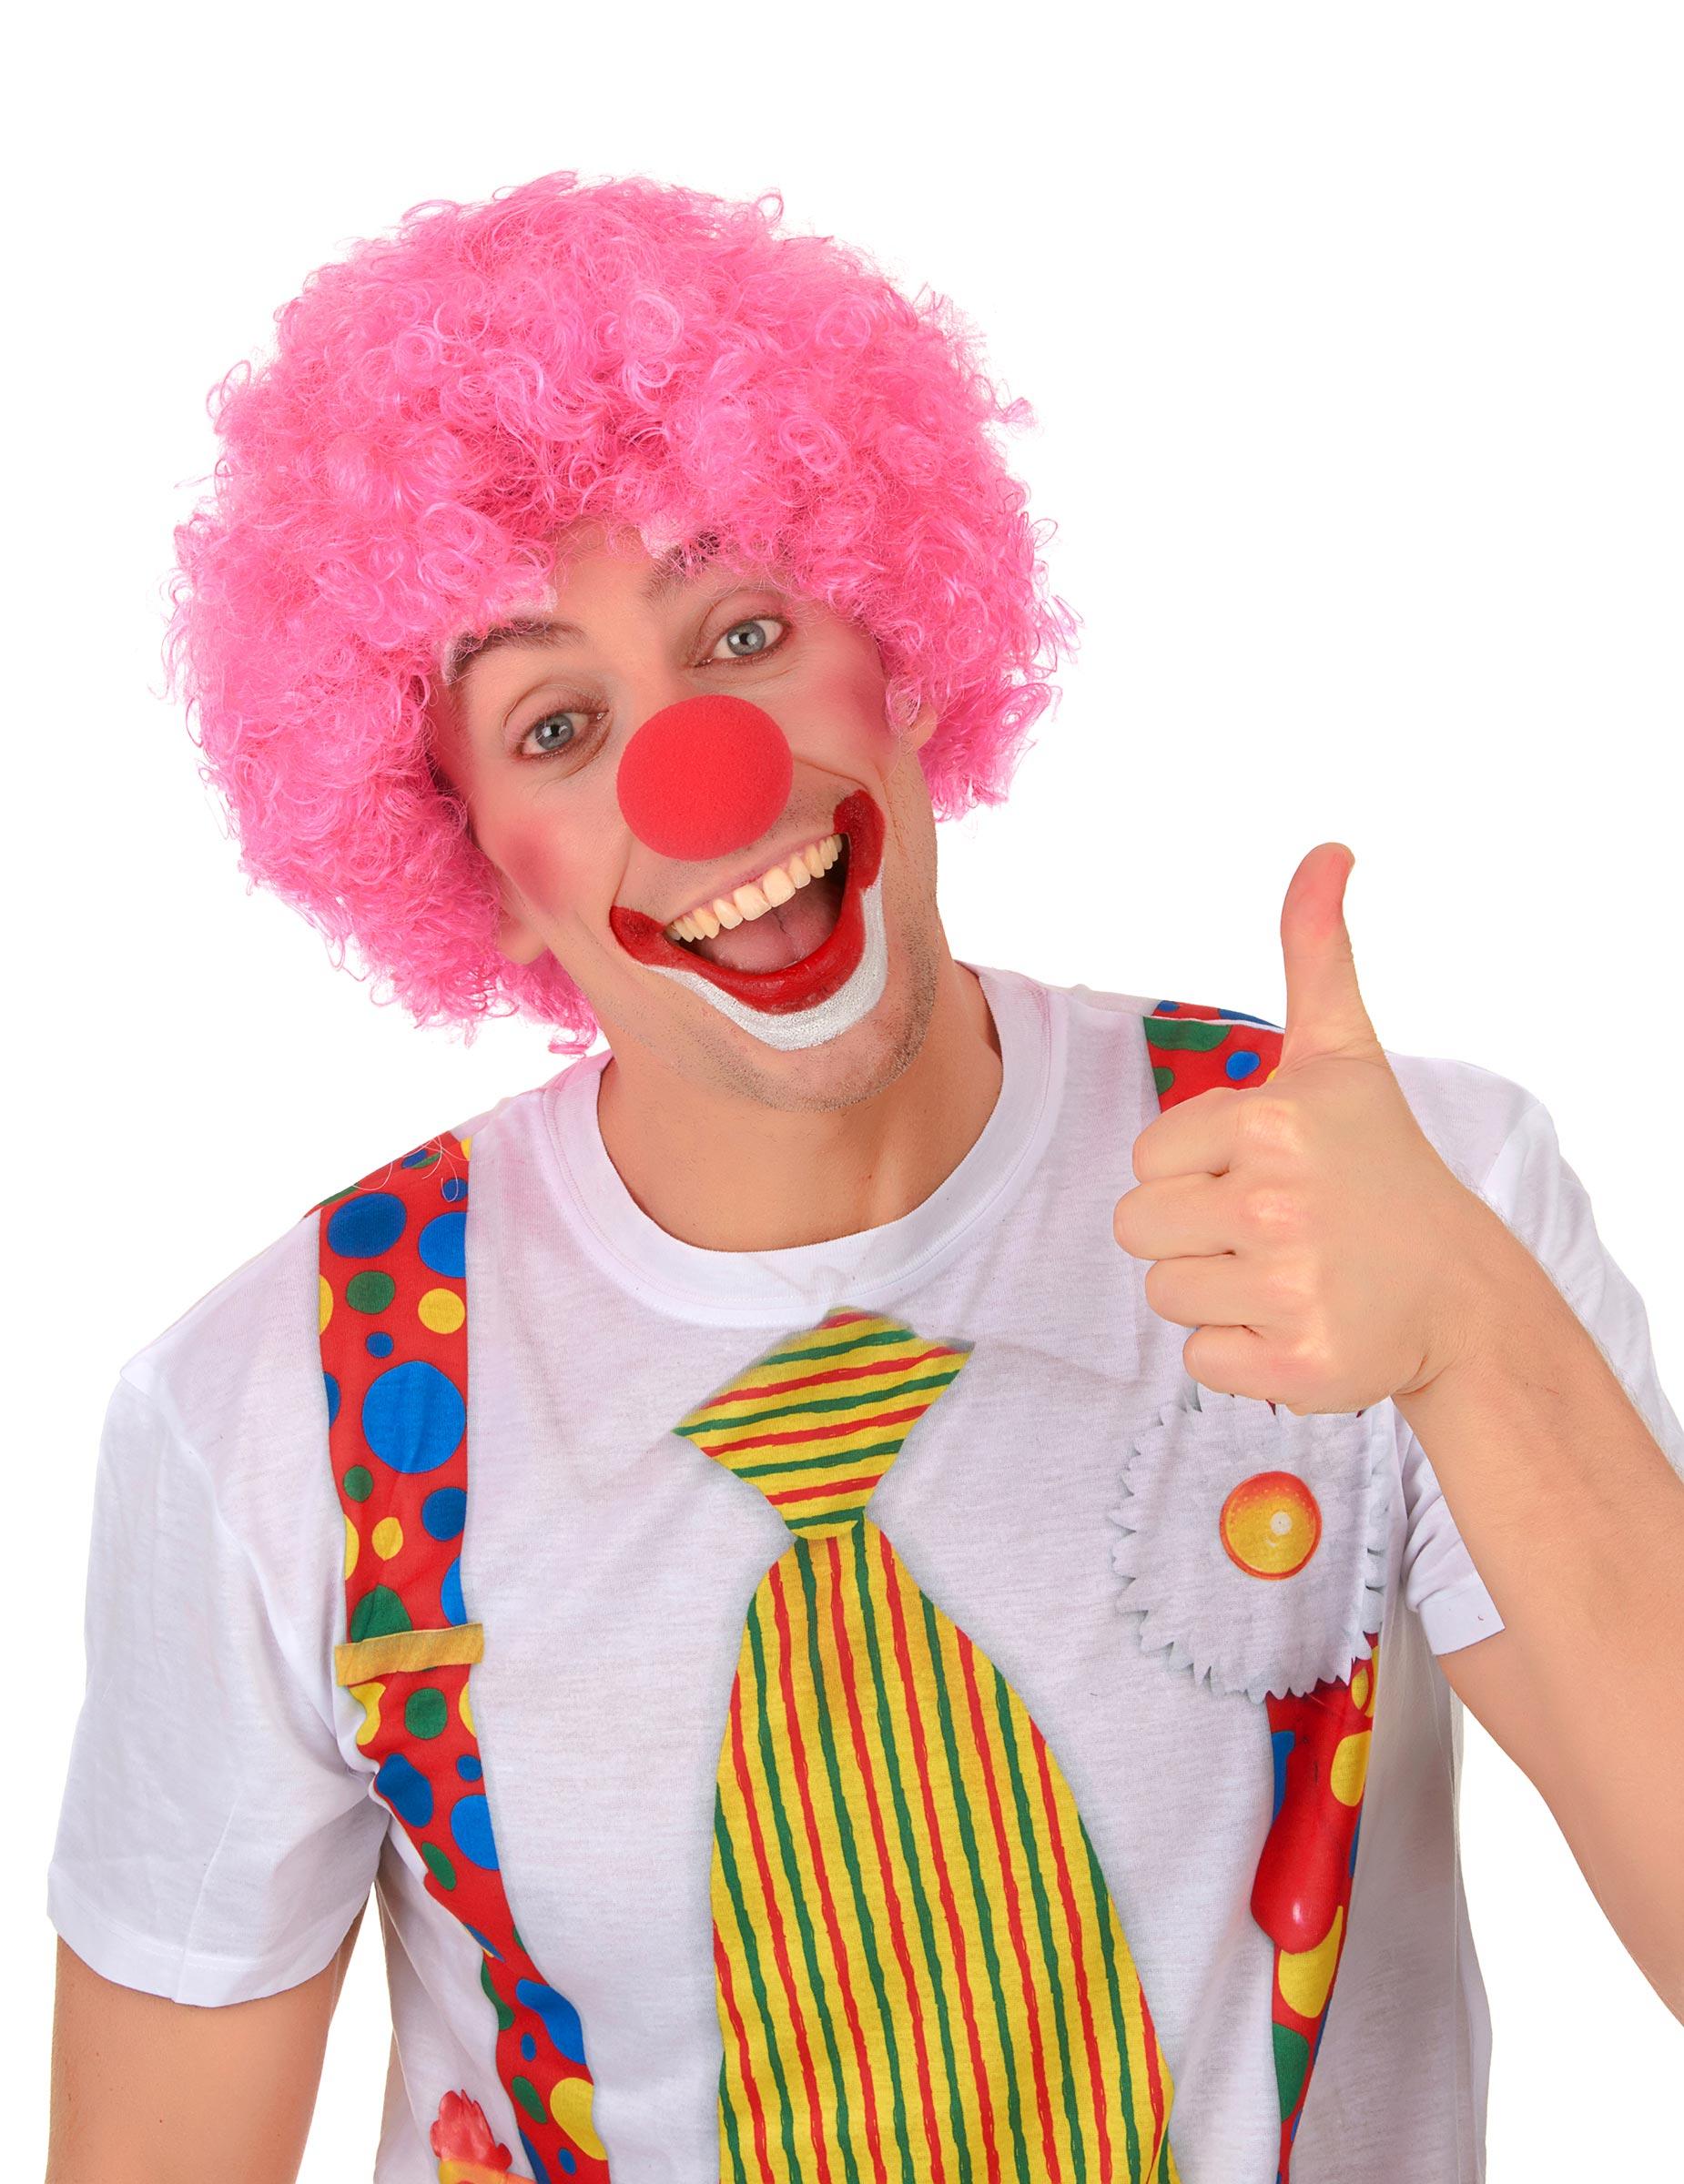 lustige clown afro per cke rosa g nstige faschings accessoires zubeh r bei karneval megastore. Black Bedroom Furniture Sets. Home Design Ideas